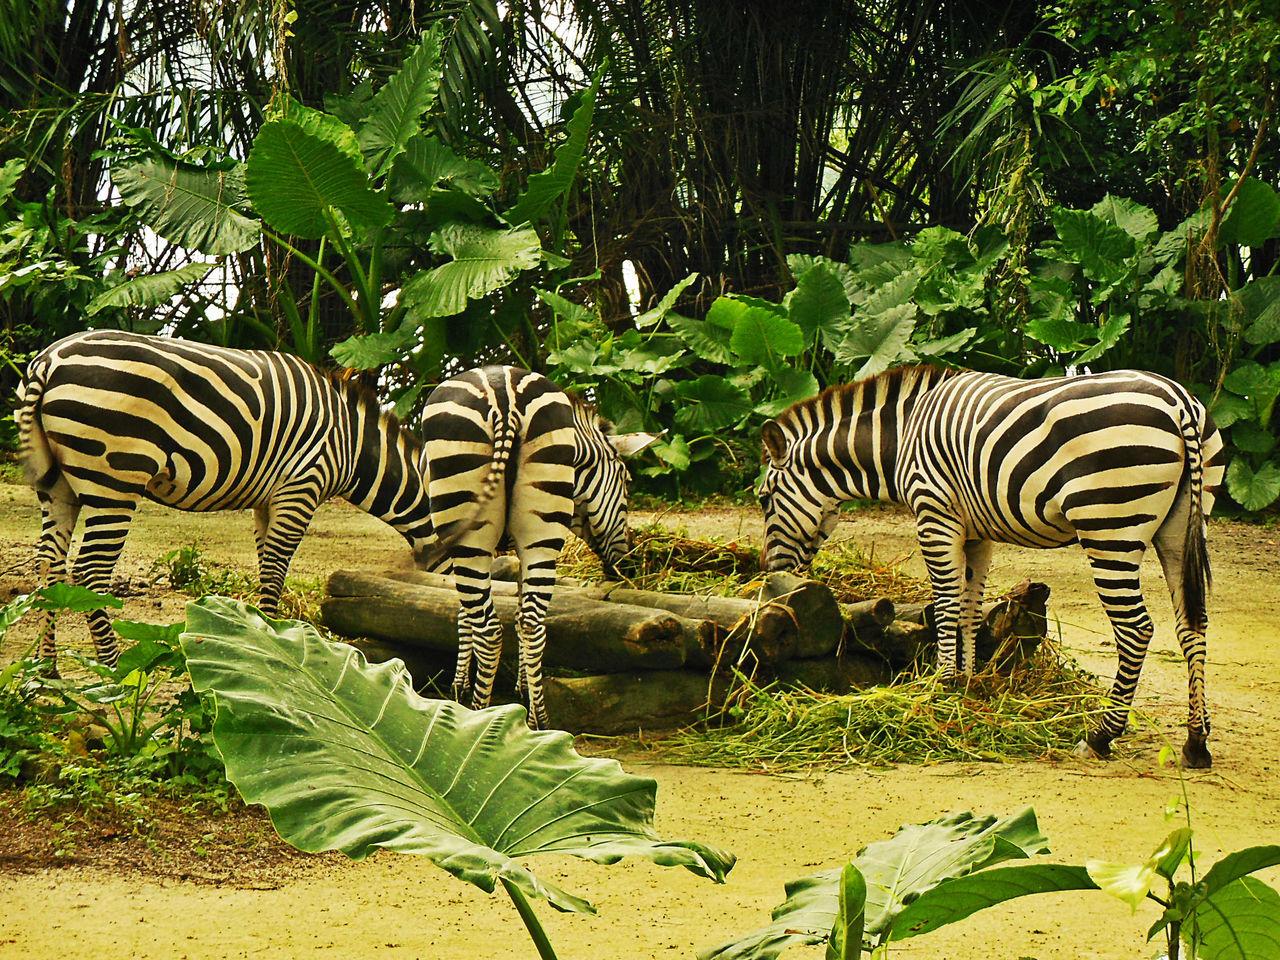 Animal Themes Animal Wildlife Animals In The Wild Herbivorous Mammal Safari Animals Singapore Zoological Garden Sneaking Up Behind Striped Zebra Zebra Herd